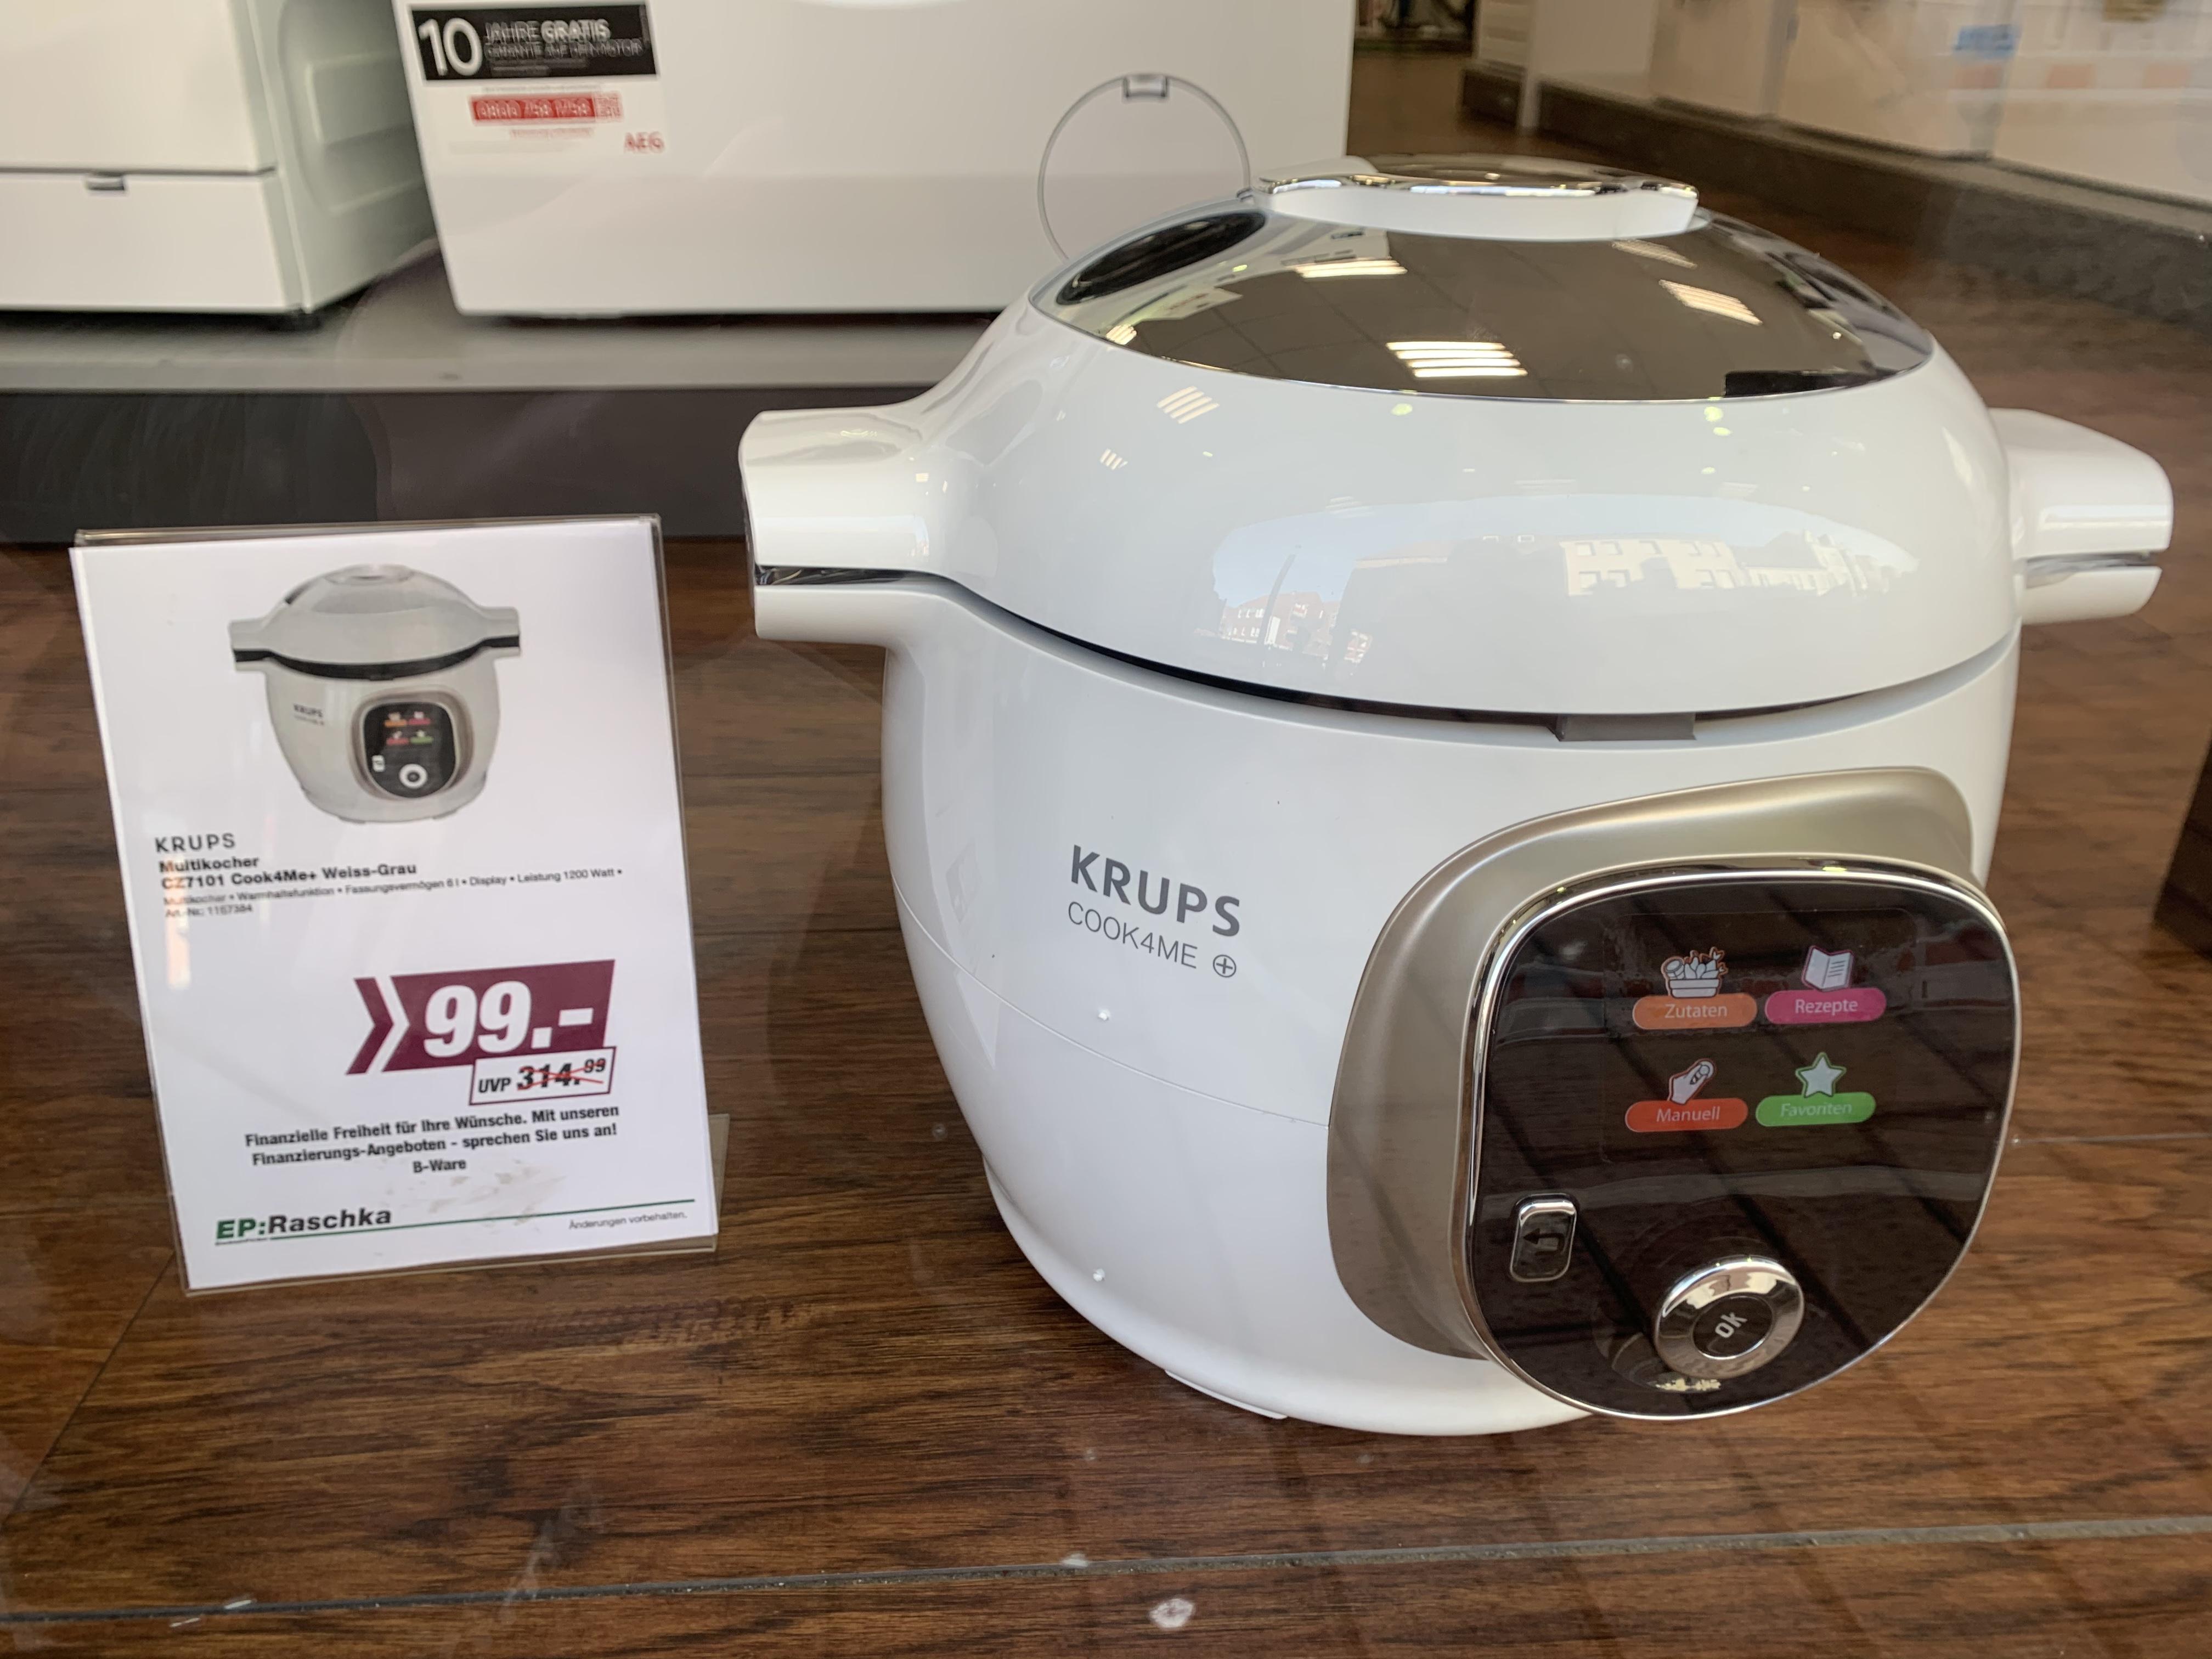 [Evtl. lokal Hamm] Krups Cook4Me+ CZ7101 Multikocher